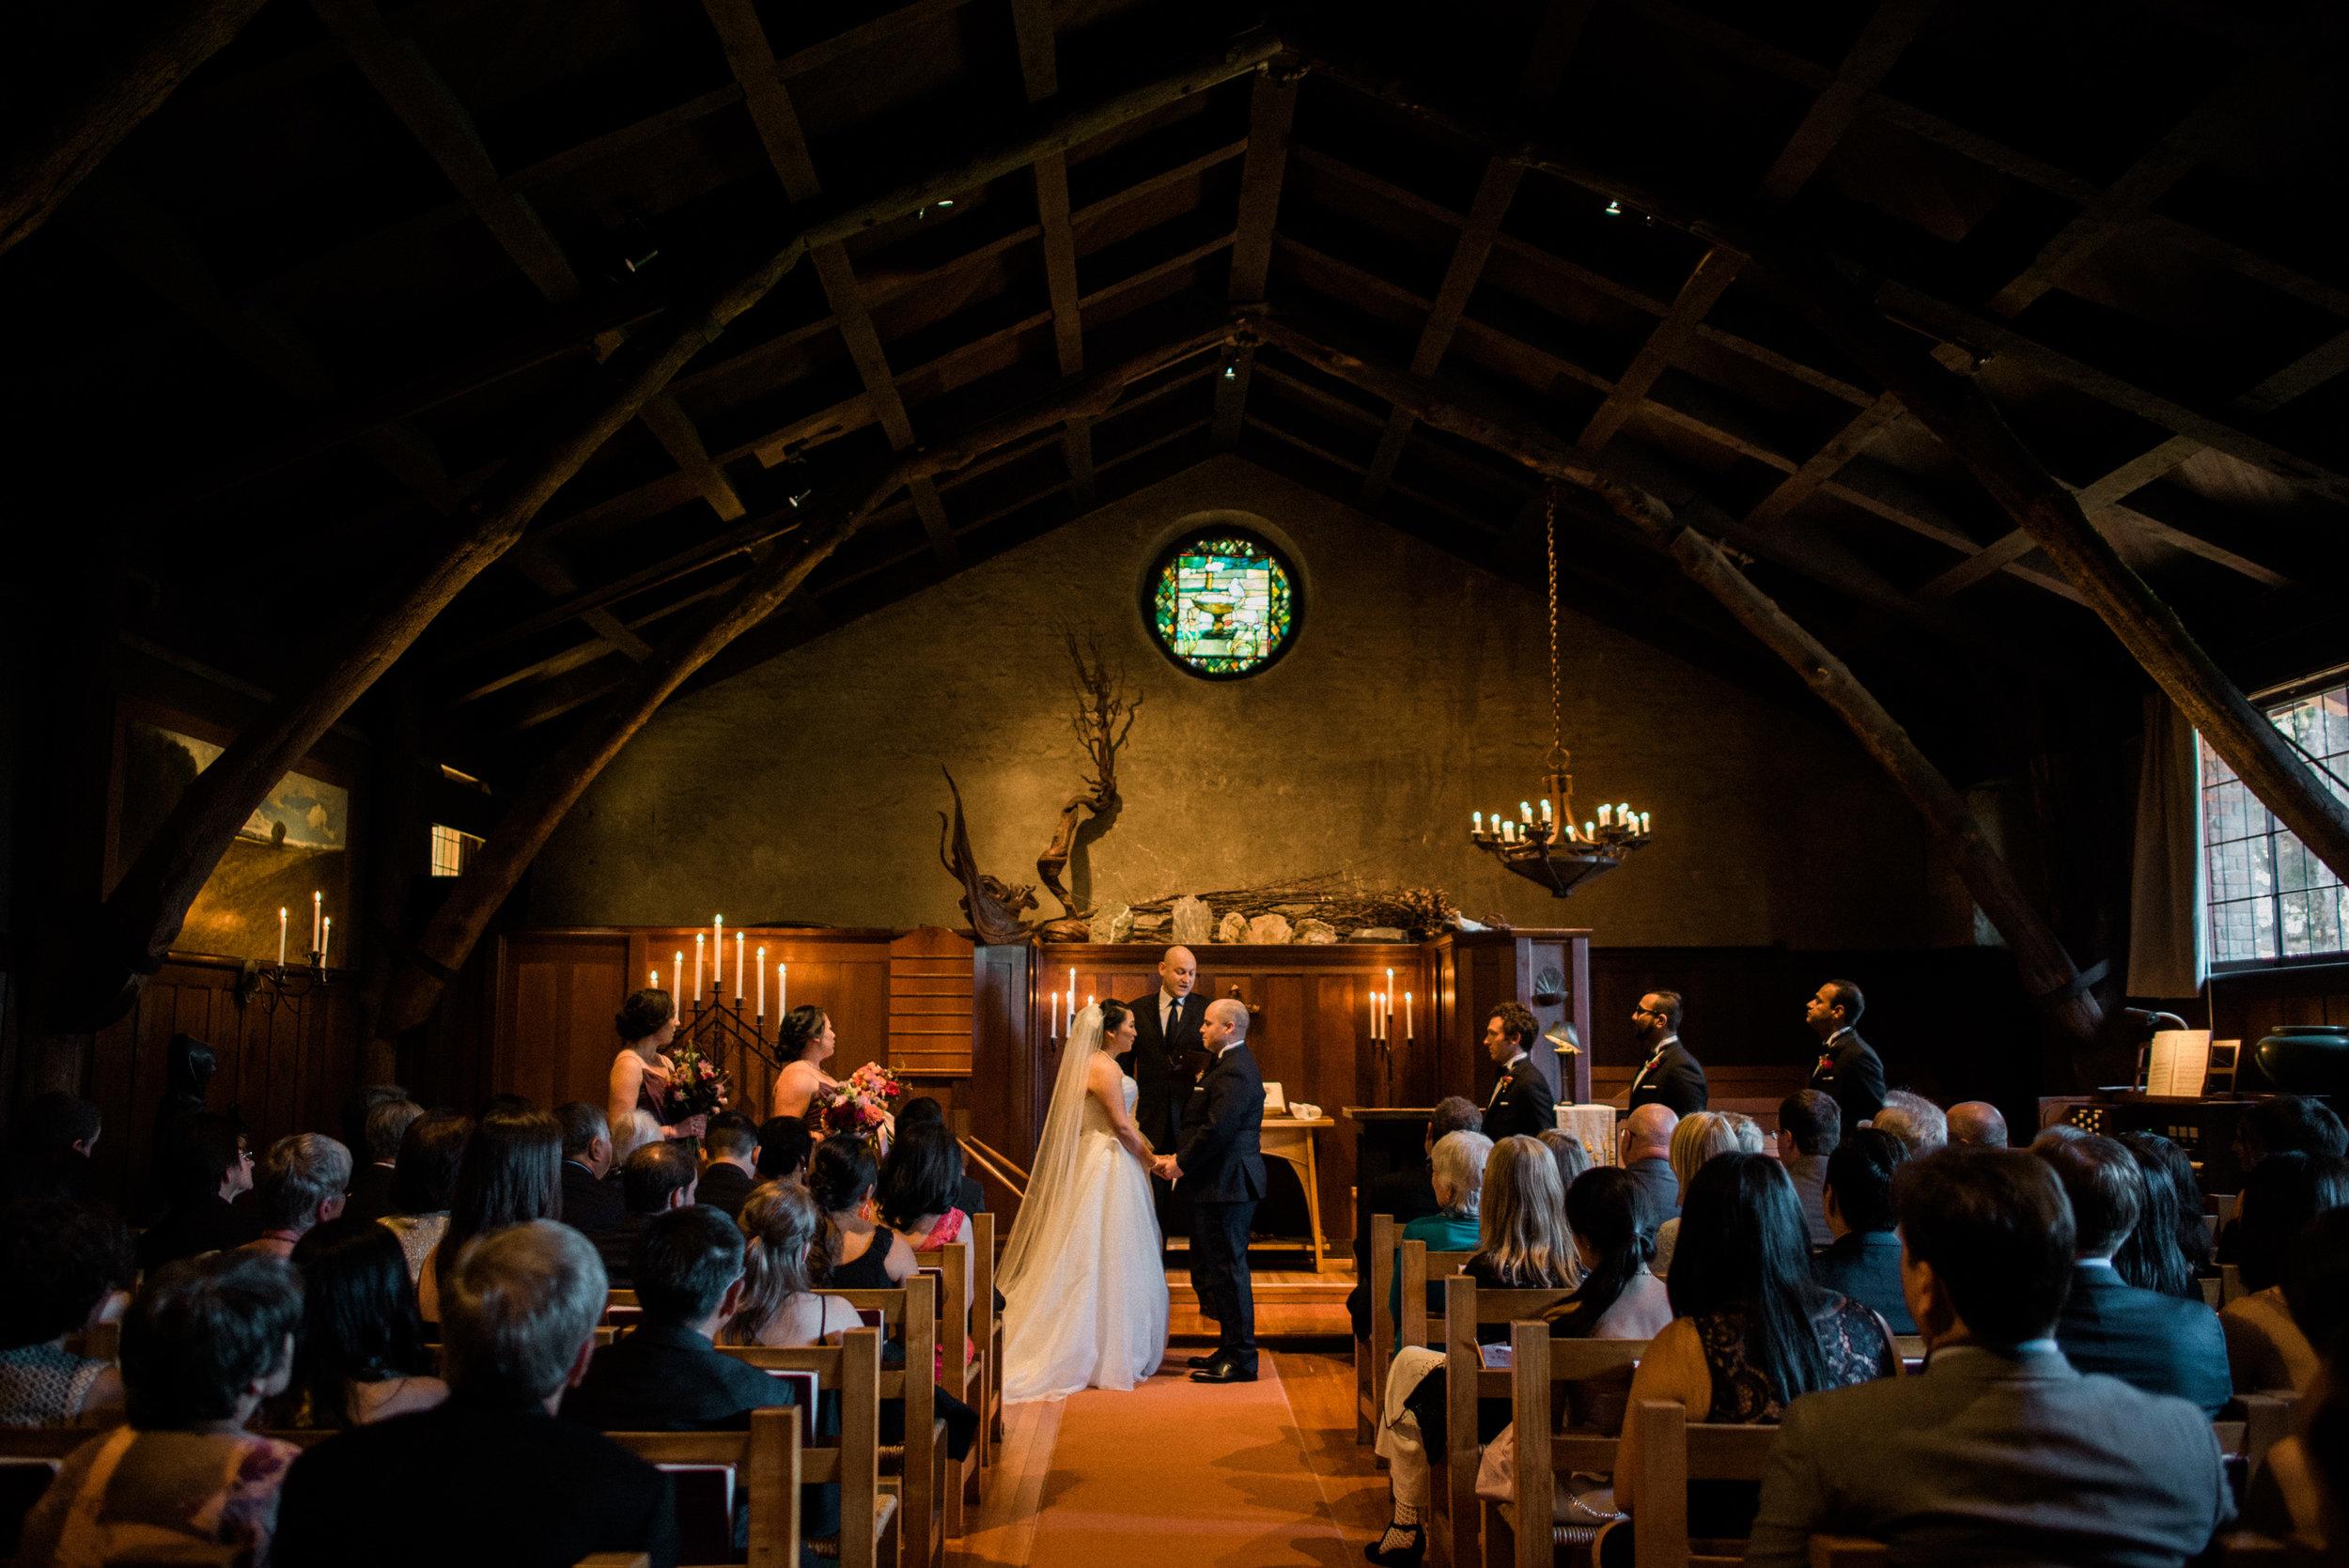 Swedenborgian Church Dogpatch Winery Wedding025.jpg